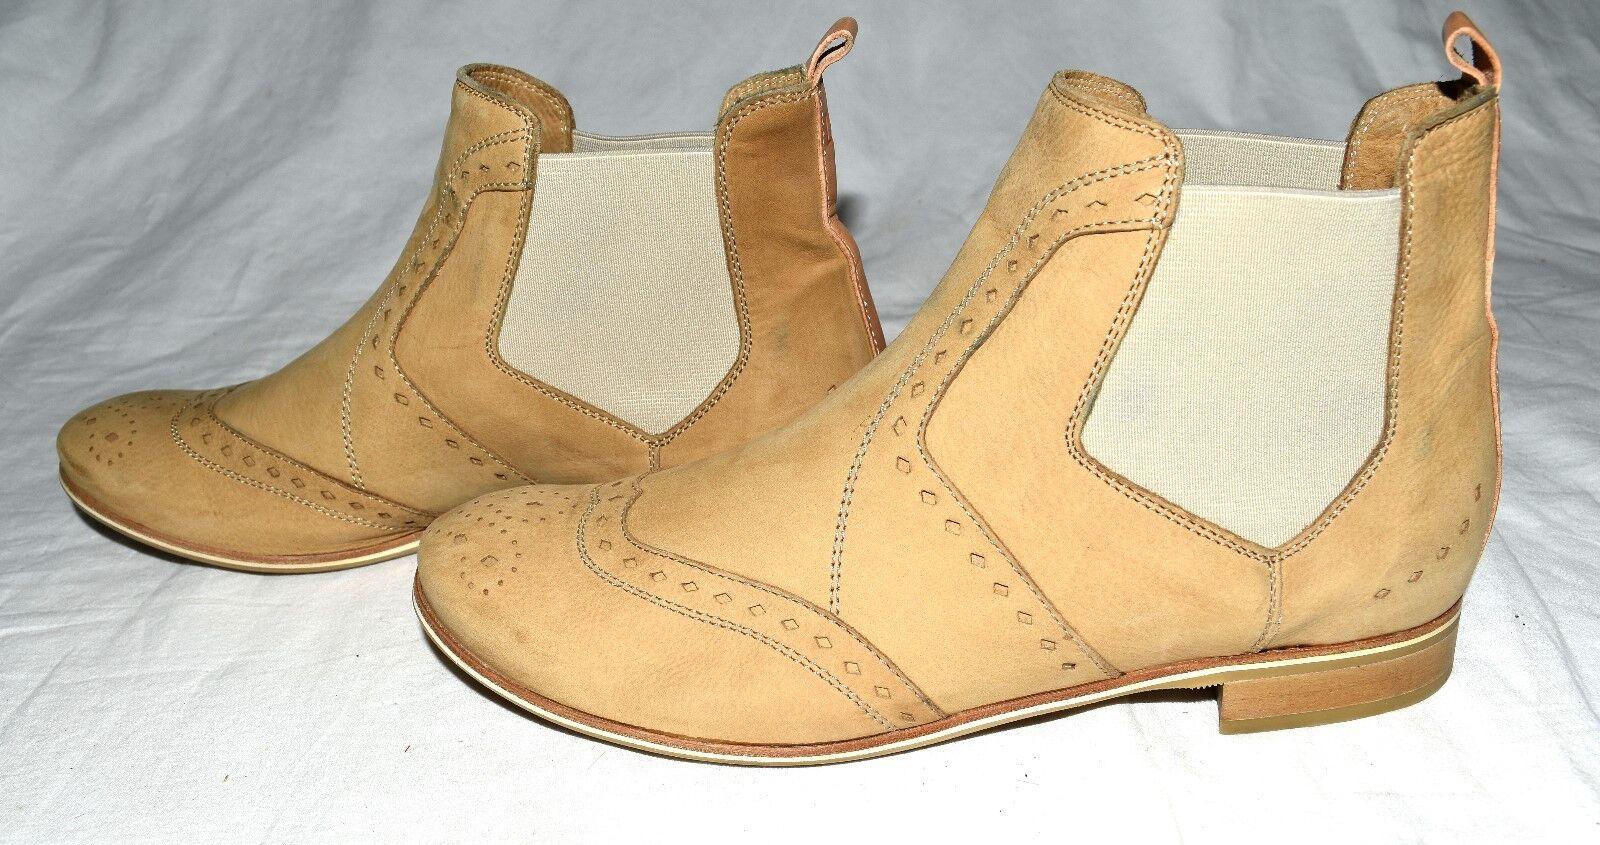 Donna Carolina Satin Castor Neutro Leather Womens Ankle Boots Sz Eur 36.5 Italy